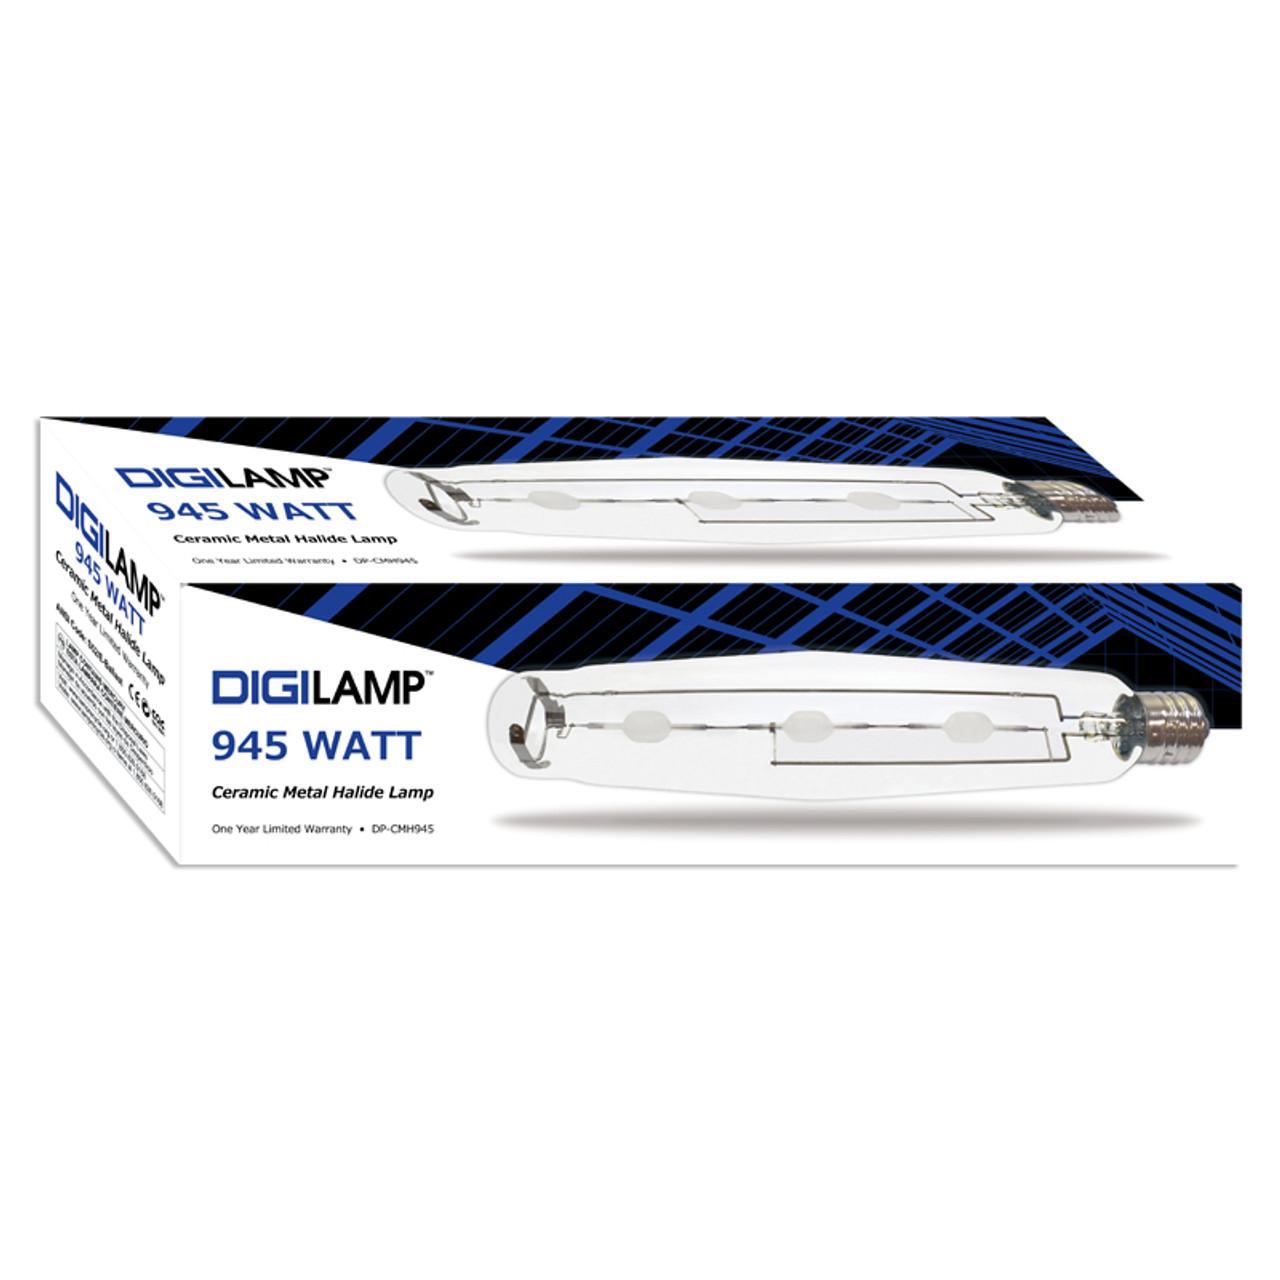 DigiLamp 945 Watt Ceramic Metal Halide CMH Lamp E39